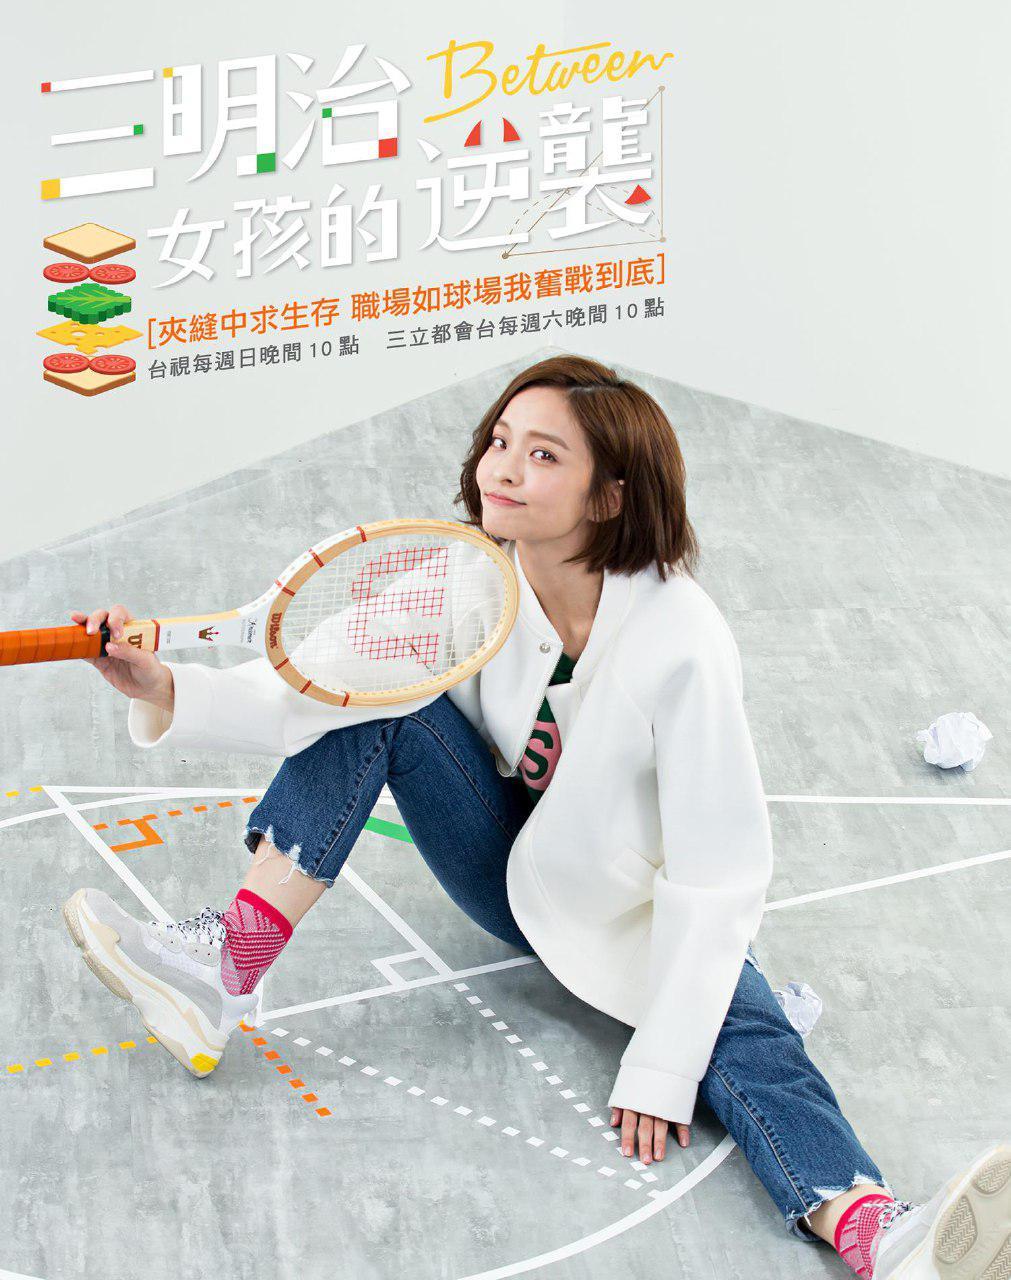 دانلود سریال تایوانی مابین Between 2018